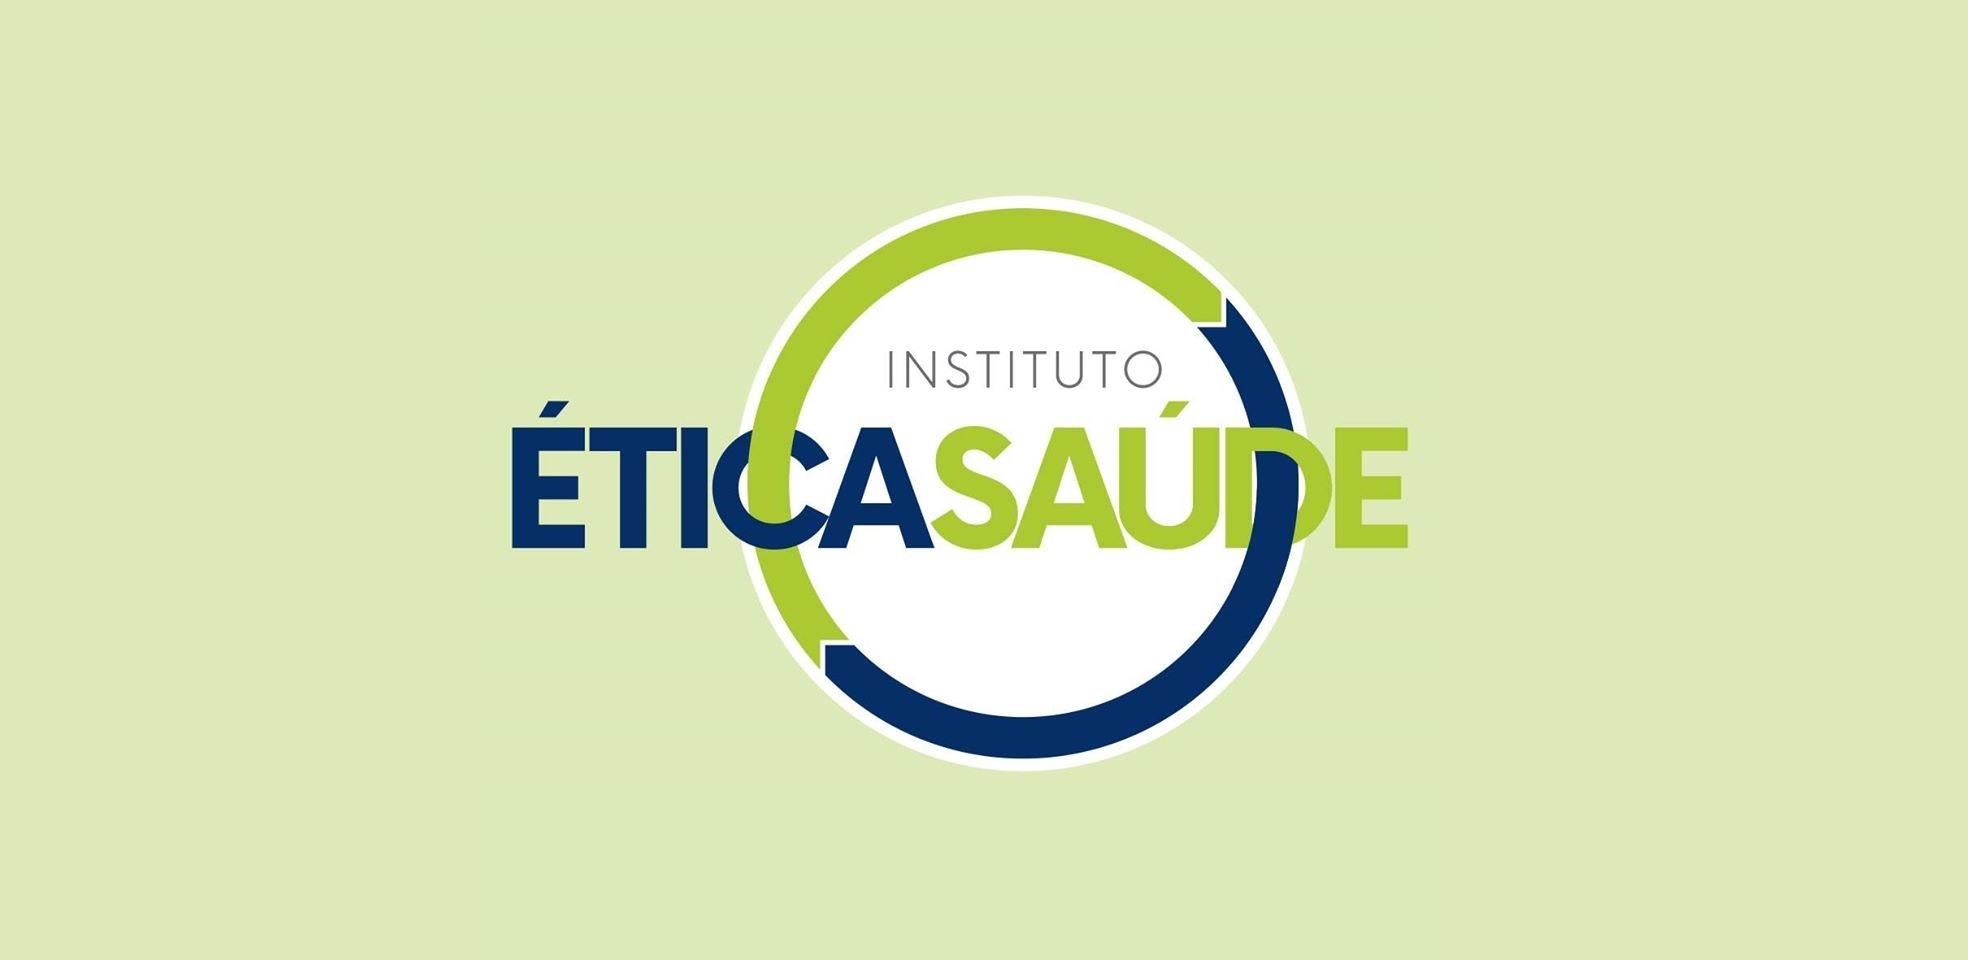 Instituto Ética Saúde anuncia dois novos projetos para coibir as fraudes na pandemia